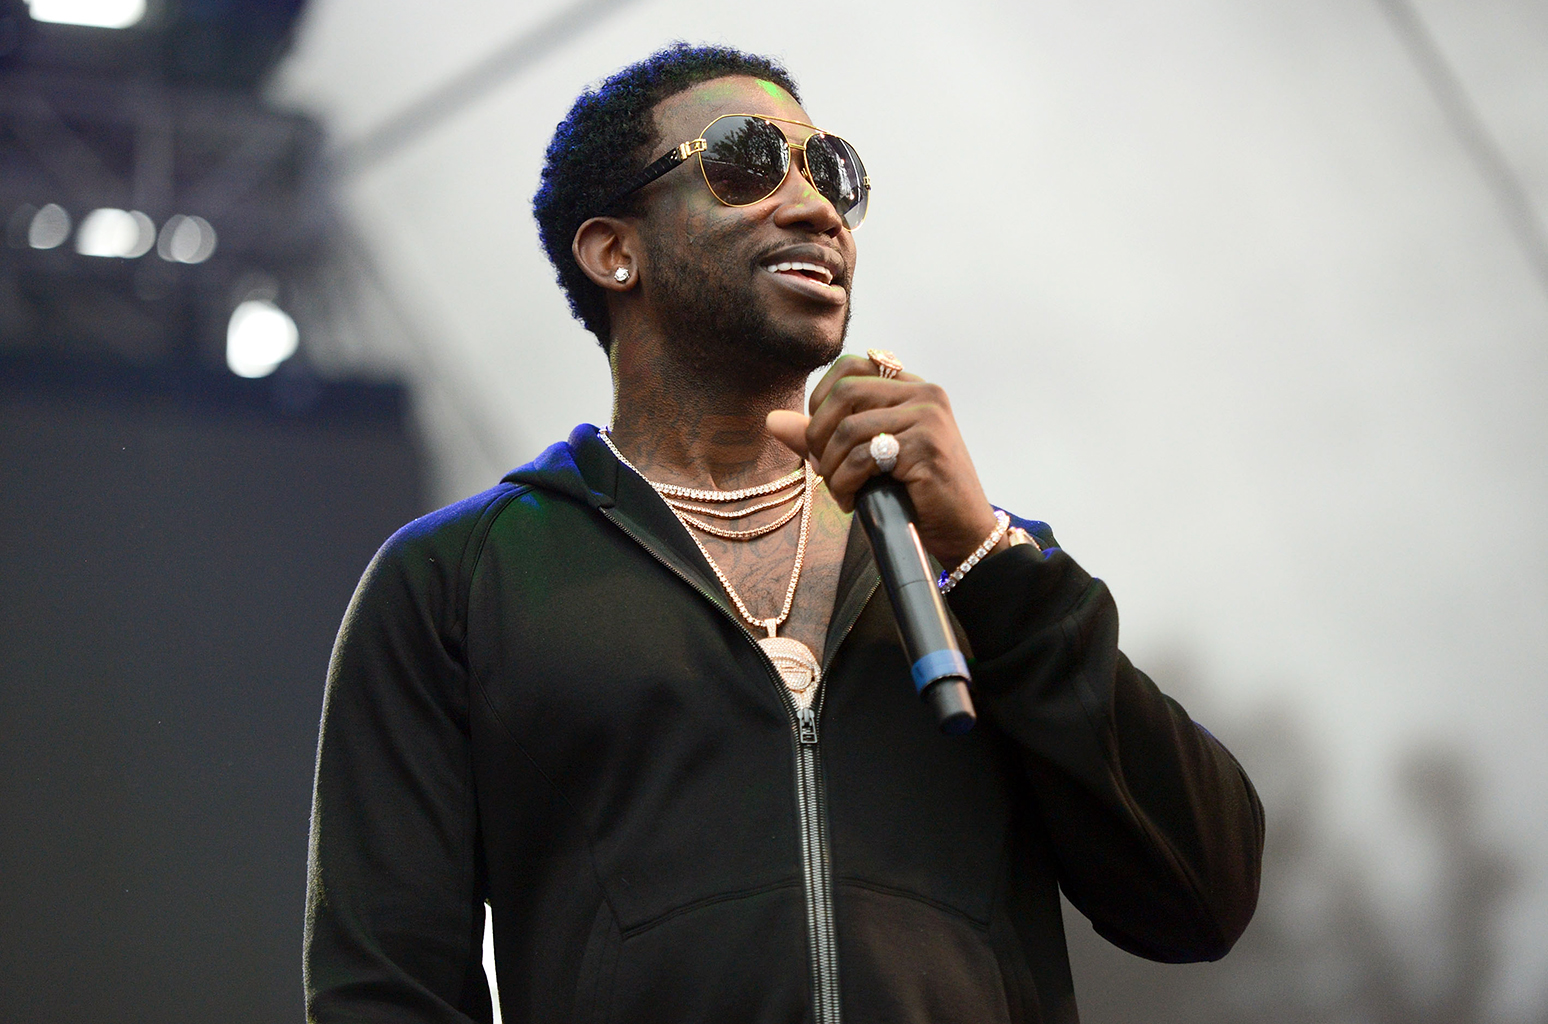 Gucci Mane Announces Release Date for New Album